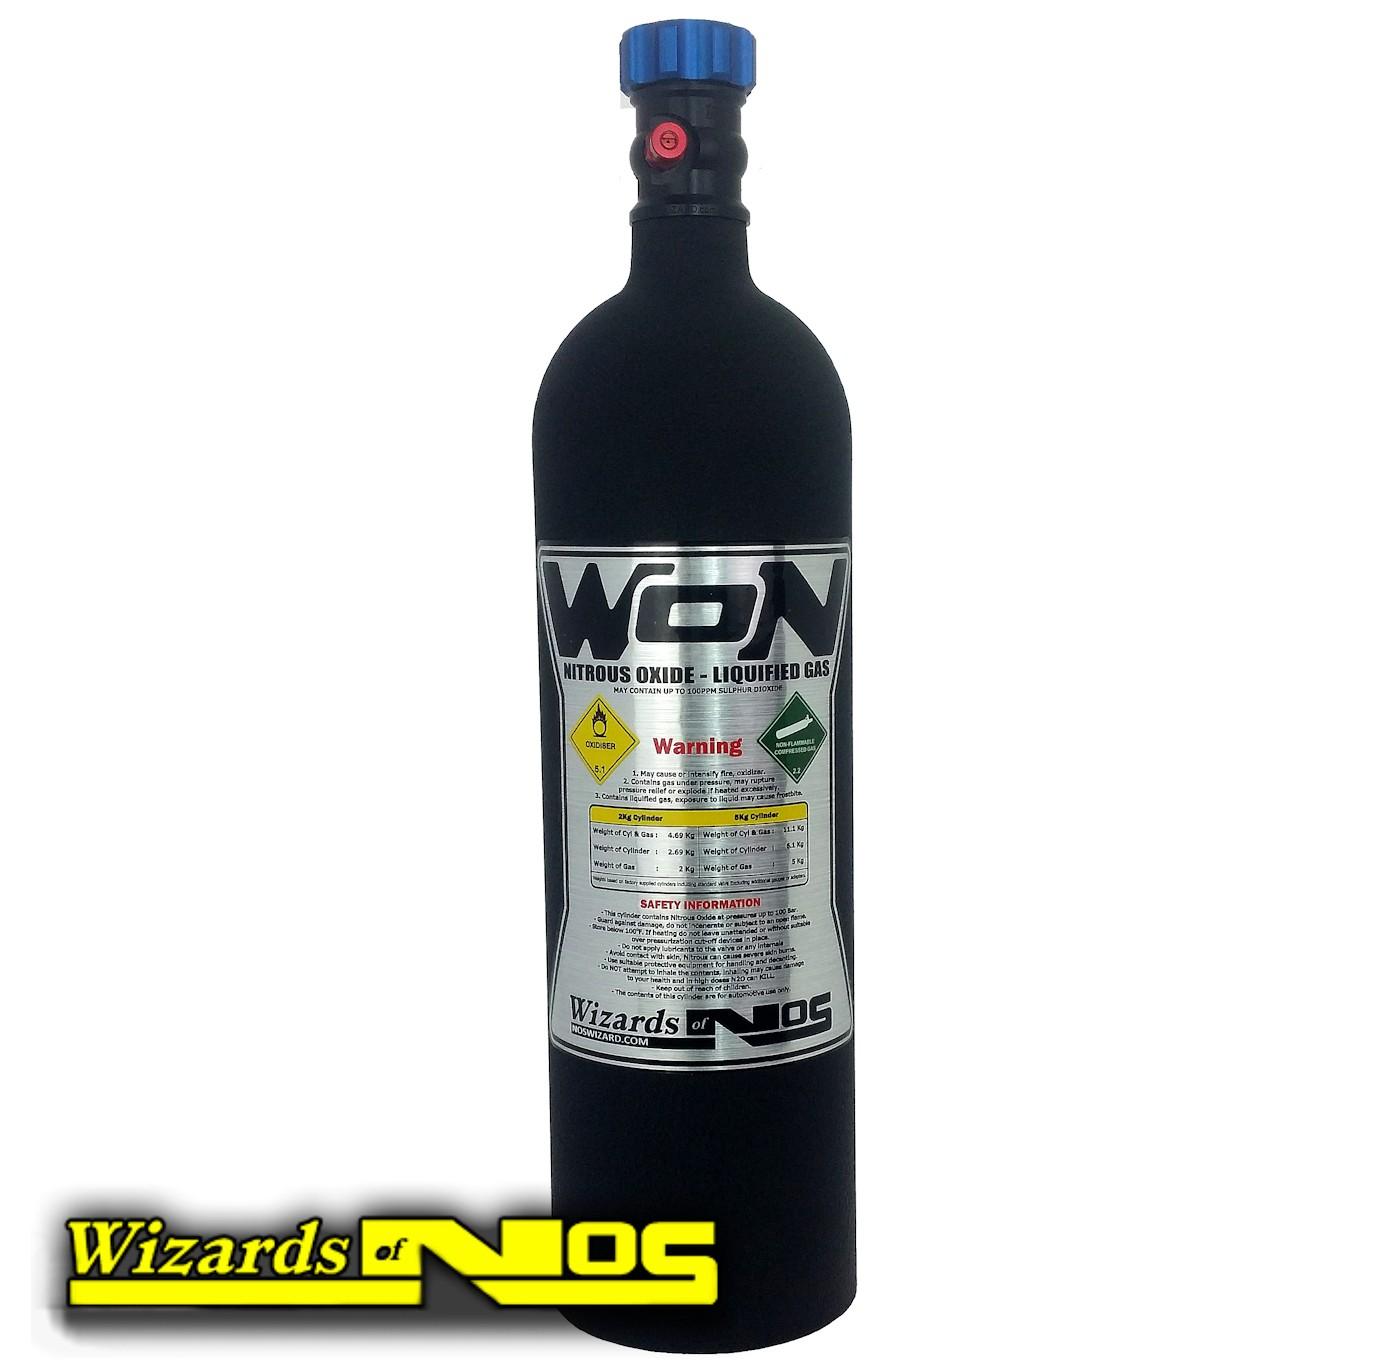 2 Kg / 5 lb Nitrous Bottle In Black Textured Finish